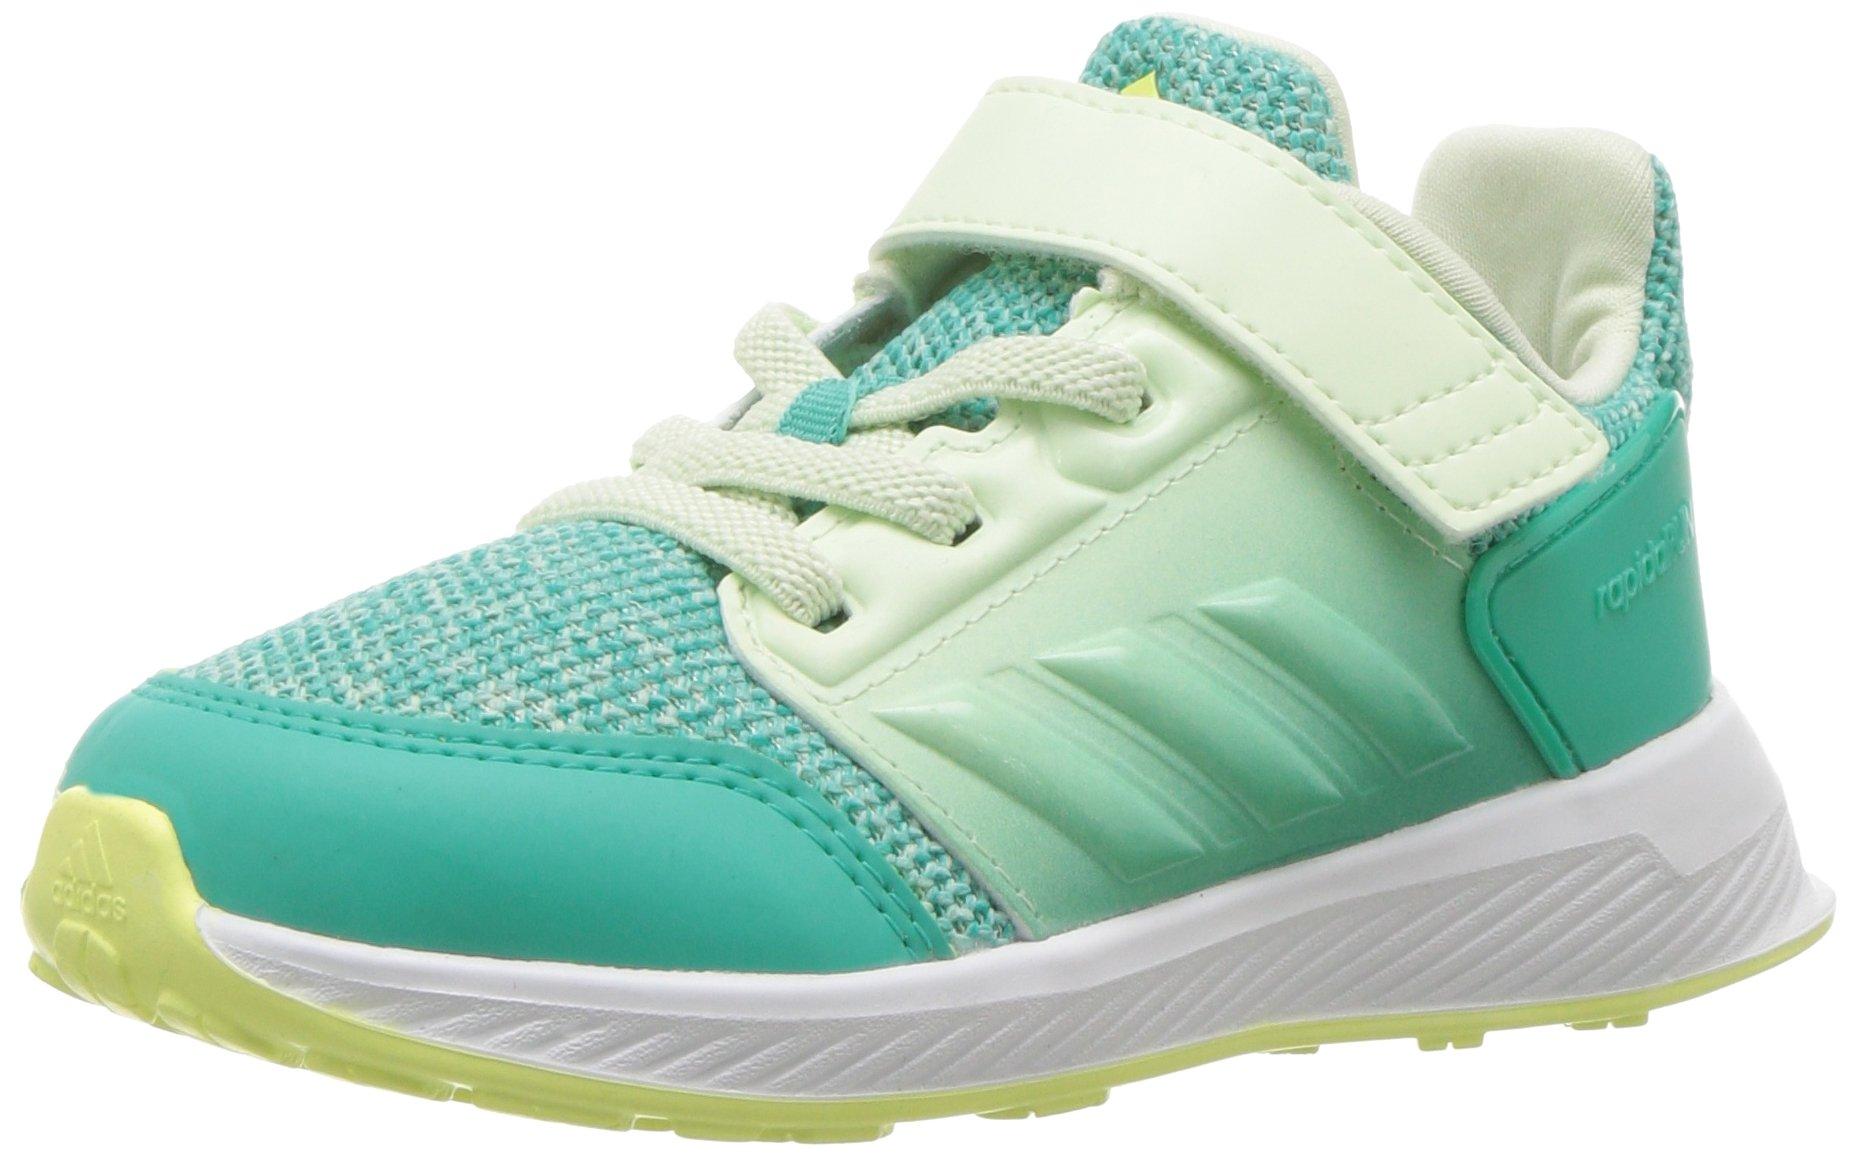 adidas Baby Rapidarun, Shock Mint/Shock Mint/Aero Green, 7 M US Toddler